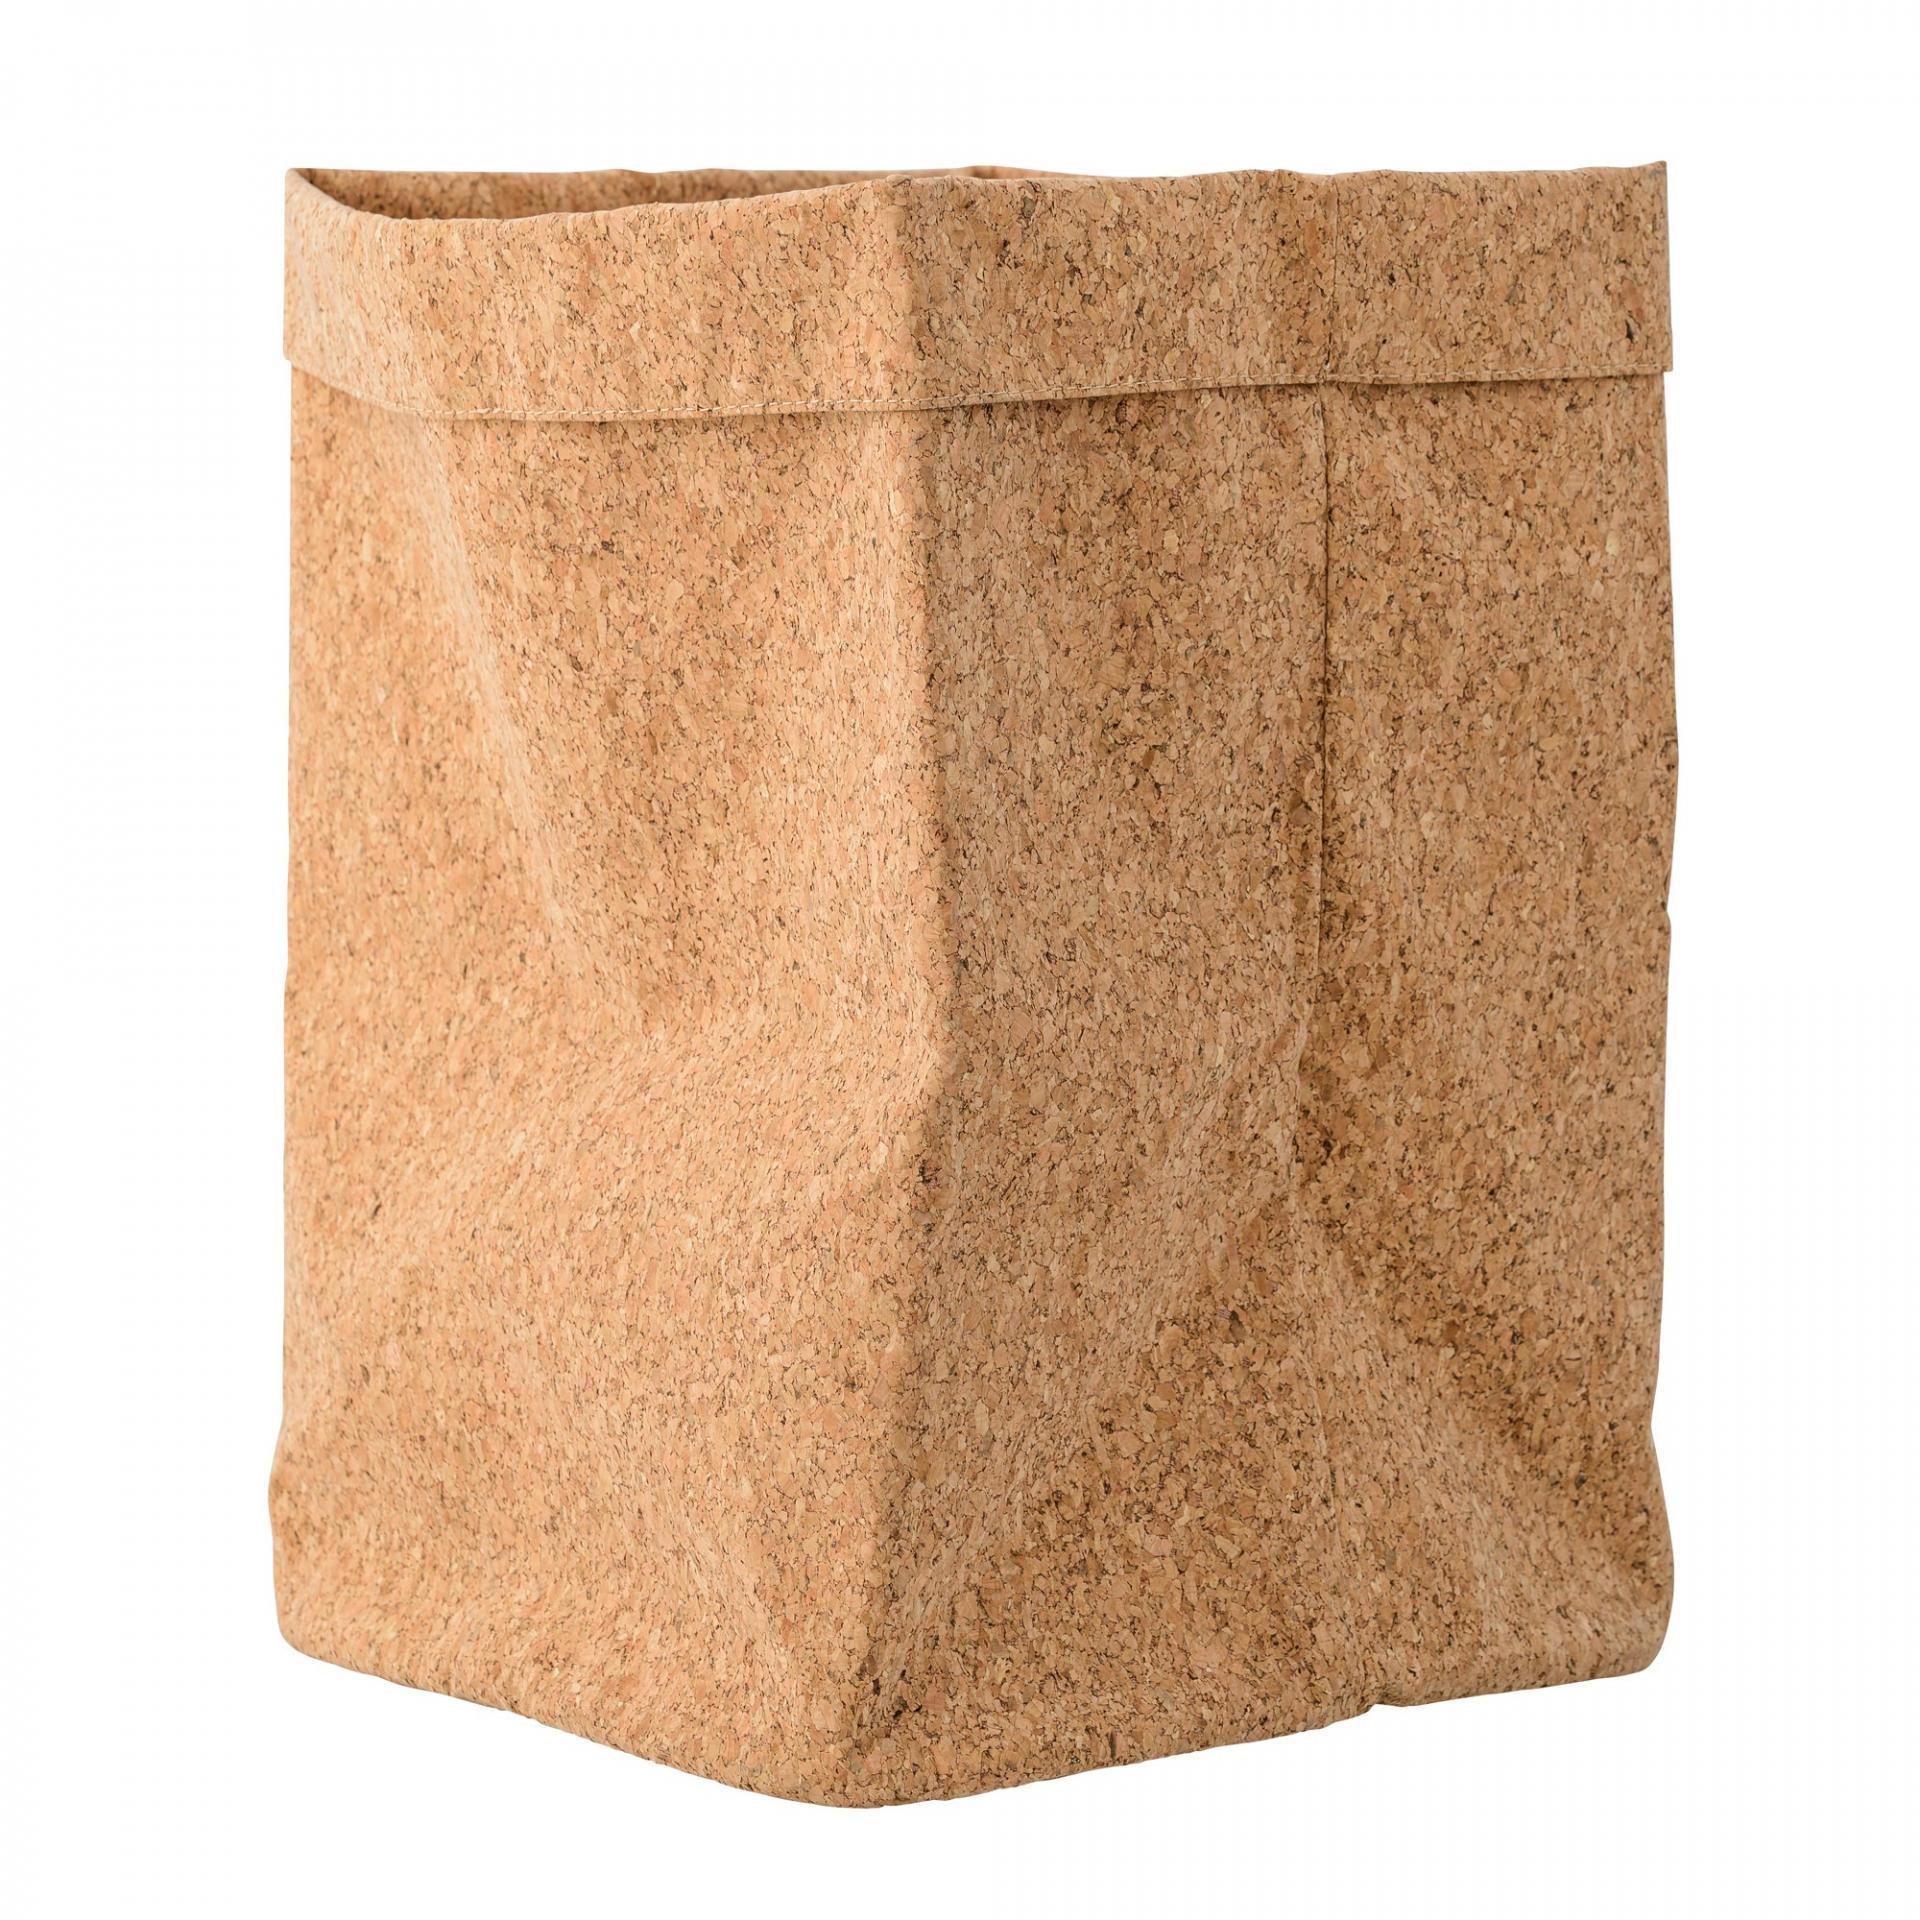 Bloomingville Úložný korkový box Light Brown, hnědá barva, korek